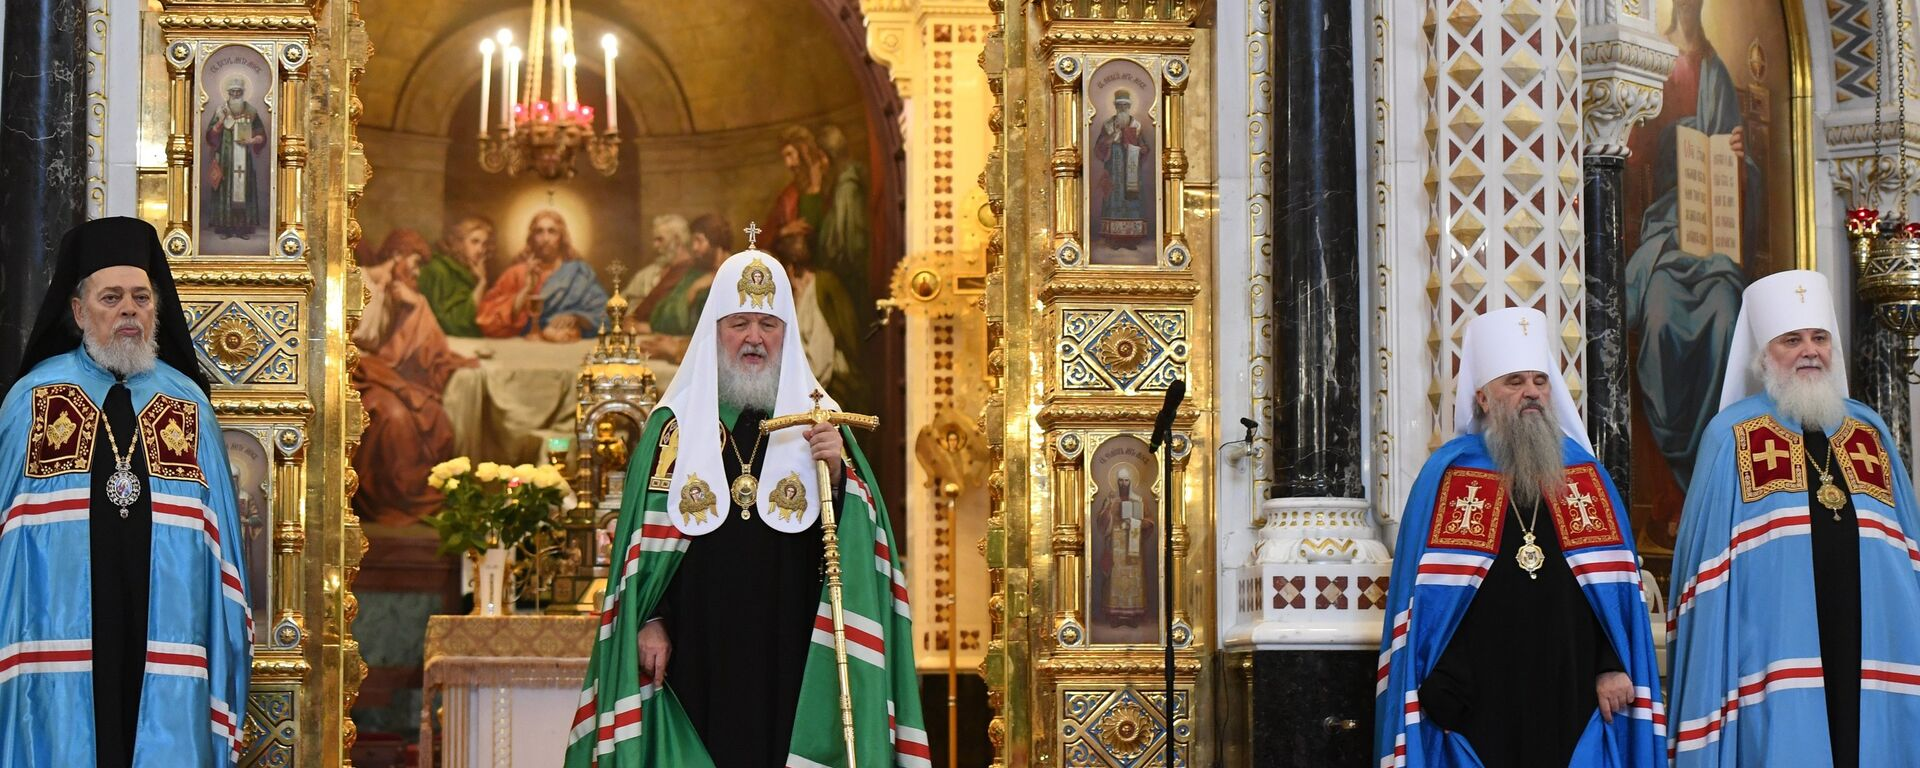 Руски патријарх Кирил - Sputnik Србија, 1920, 06.09.2021